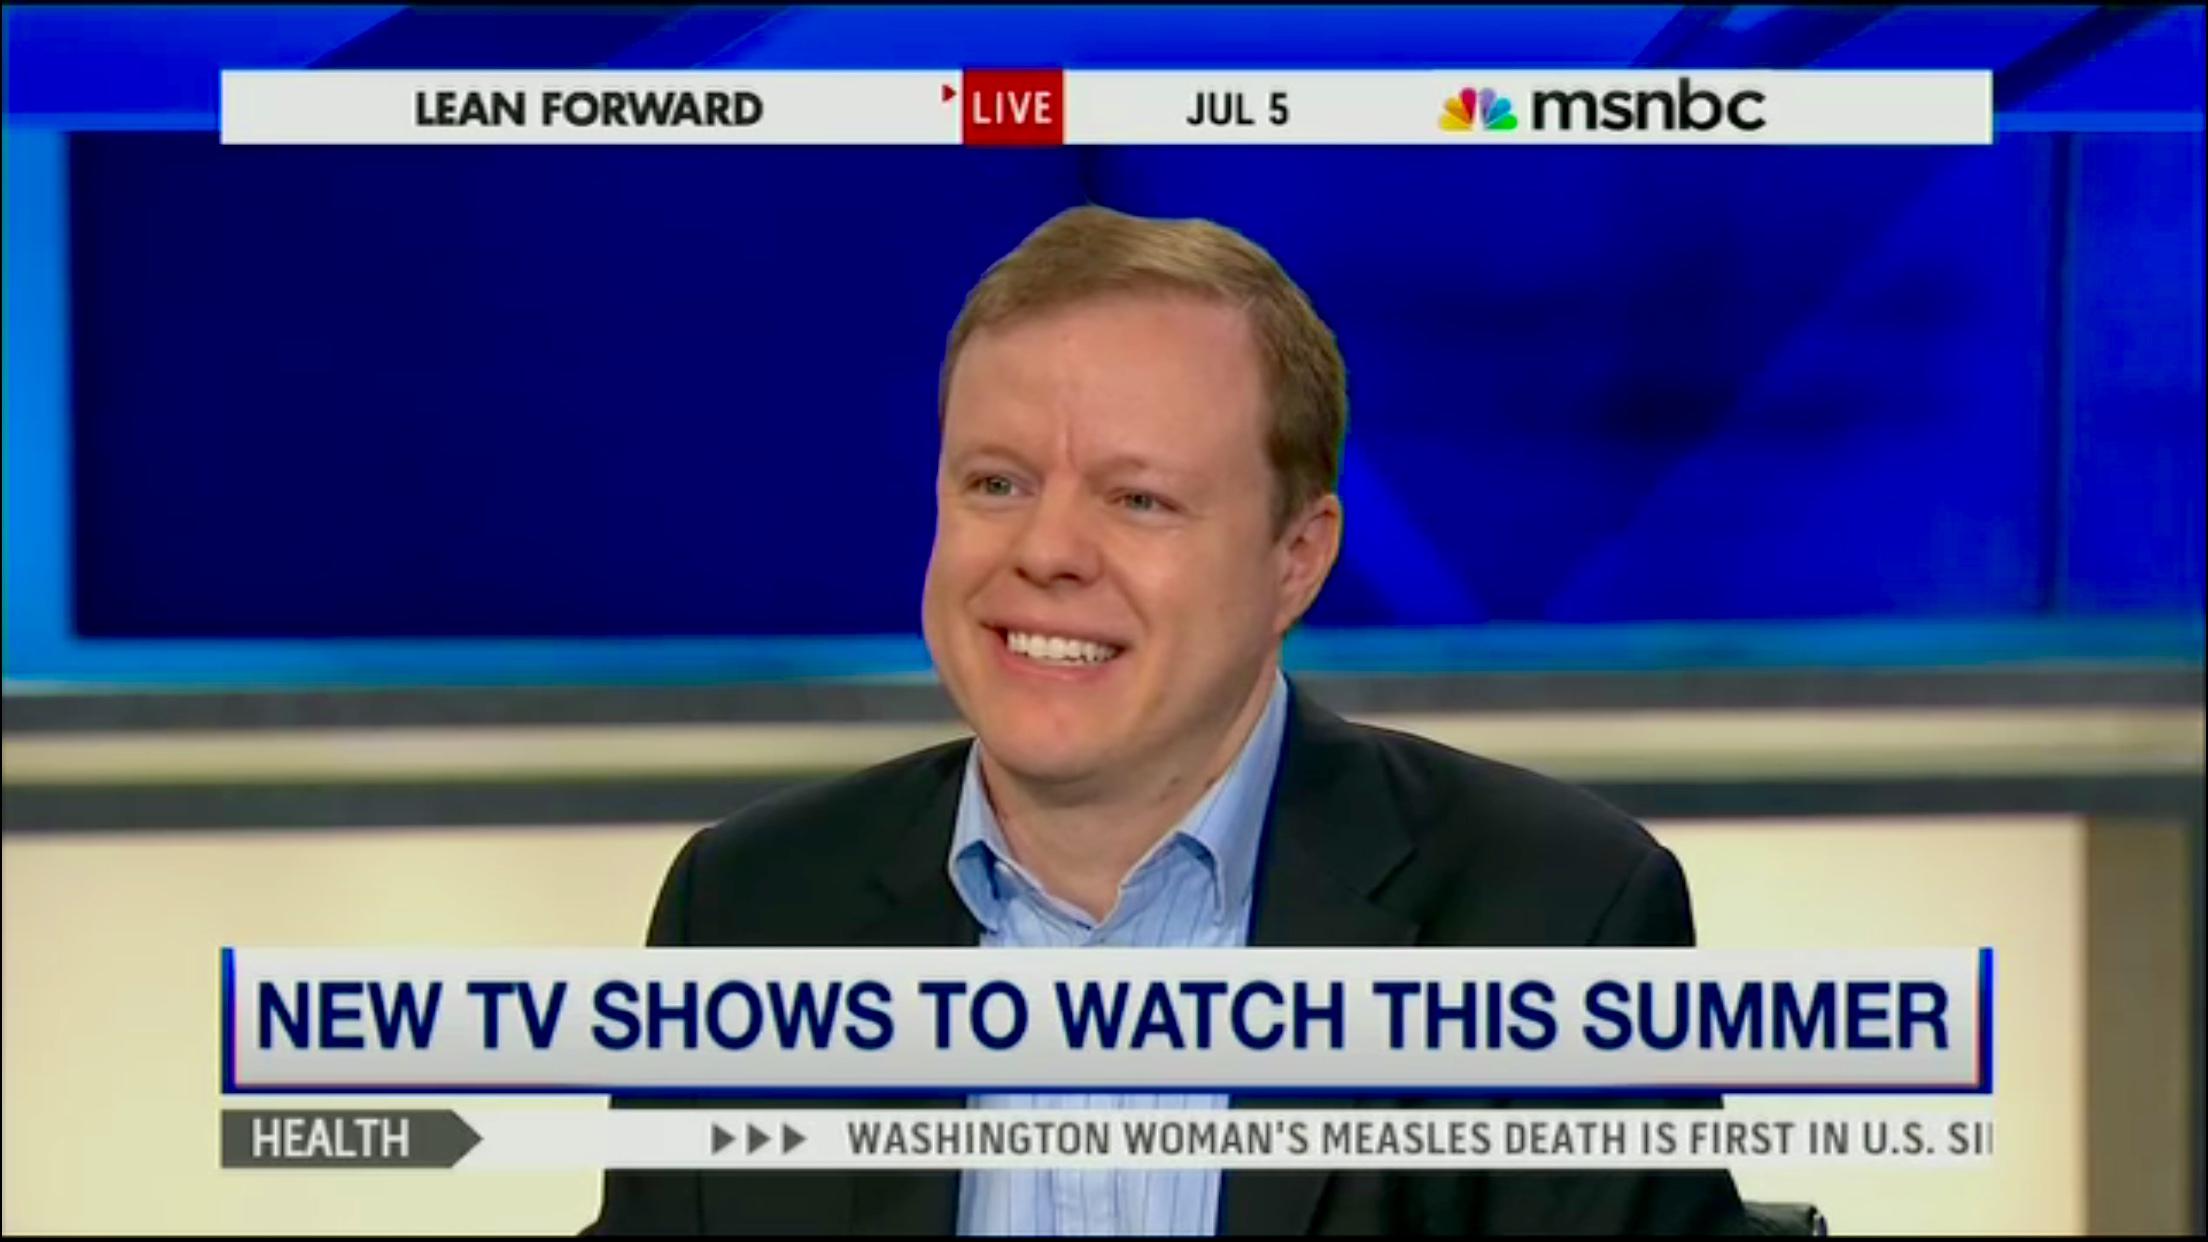 MSNBC Summer TV 3